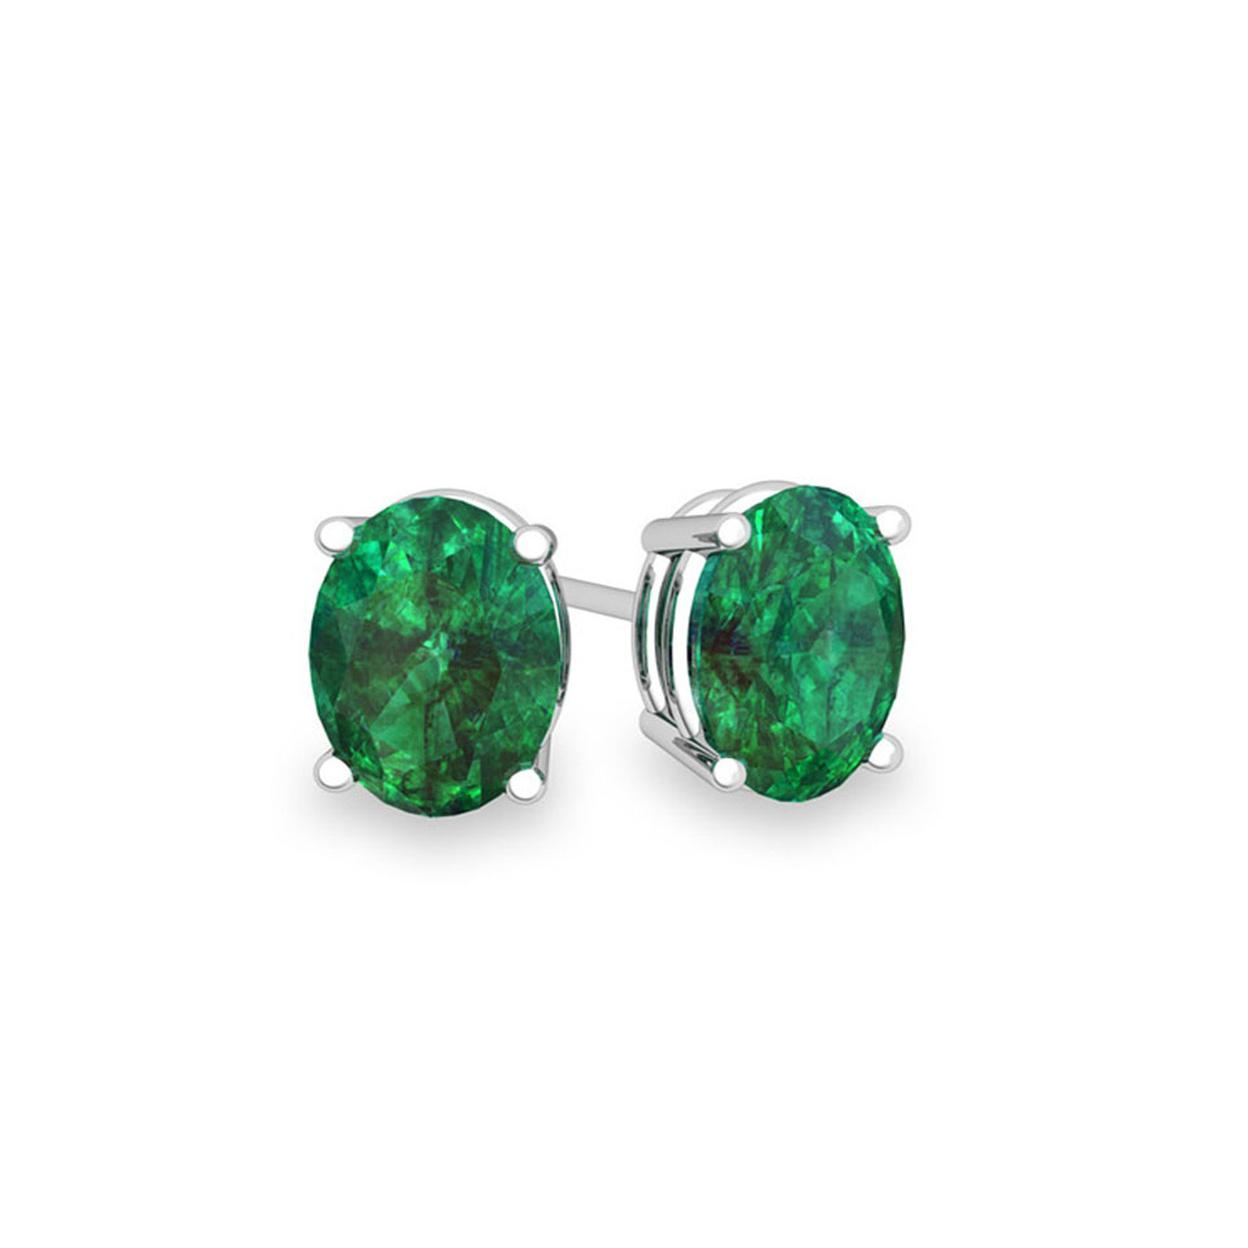 Genuine Oval Cut Emerald Studs Set In Sterling Silver